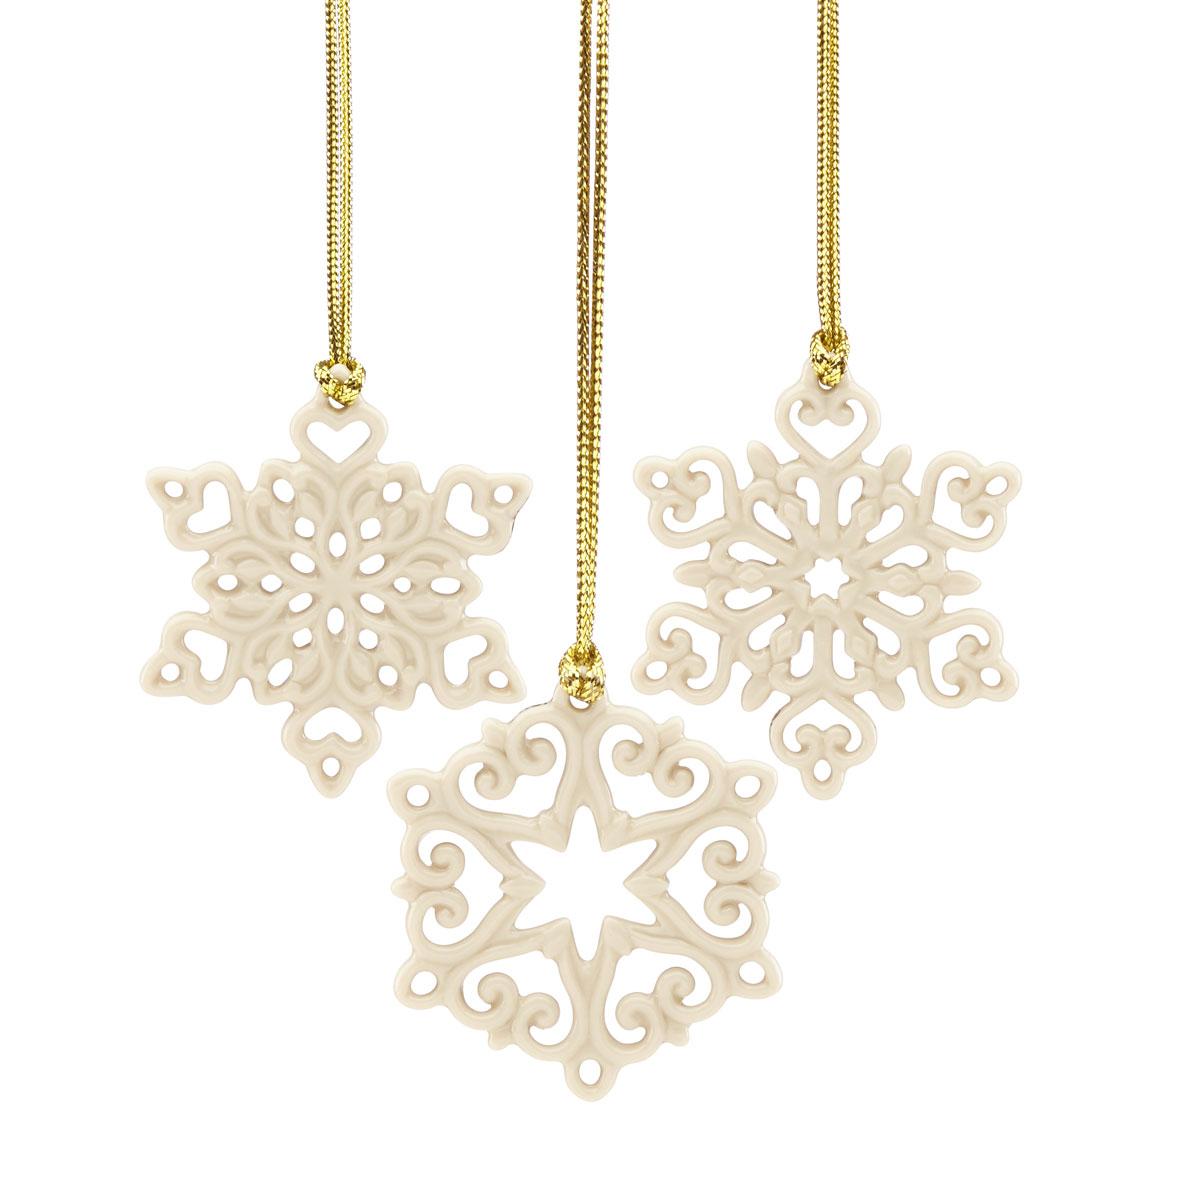 Lenox 2021 Pierced Snowflake Set of 3